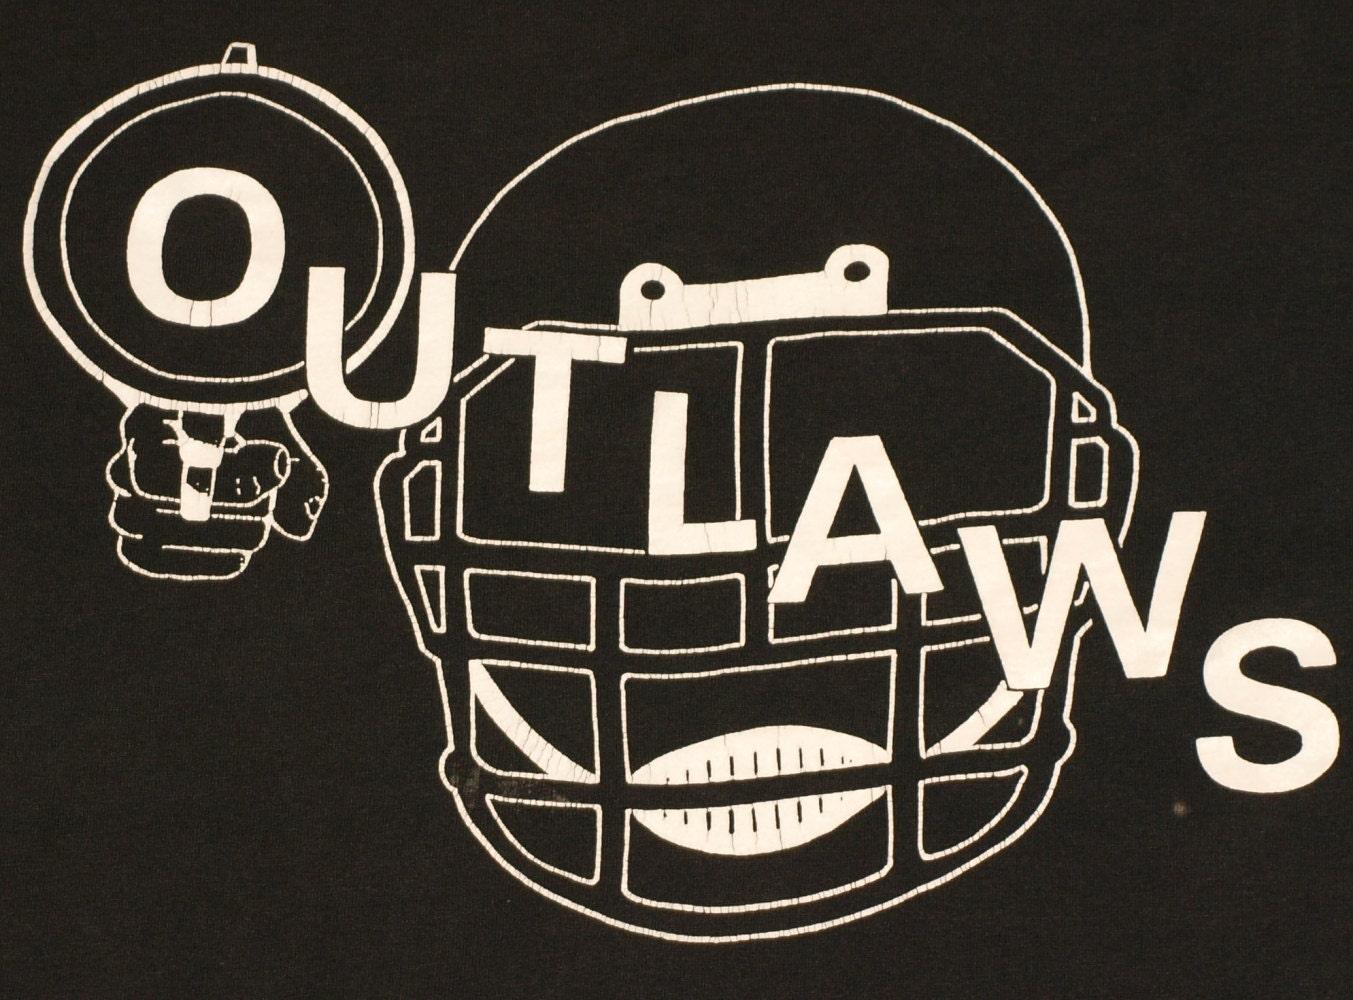 Charlie outlaw logo